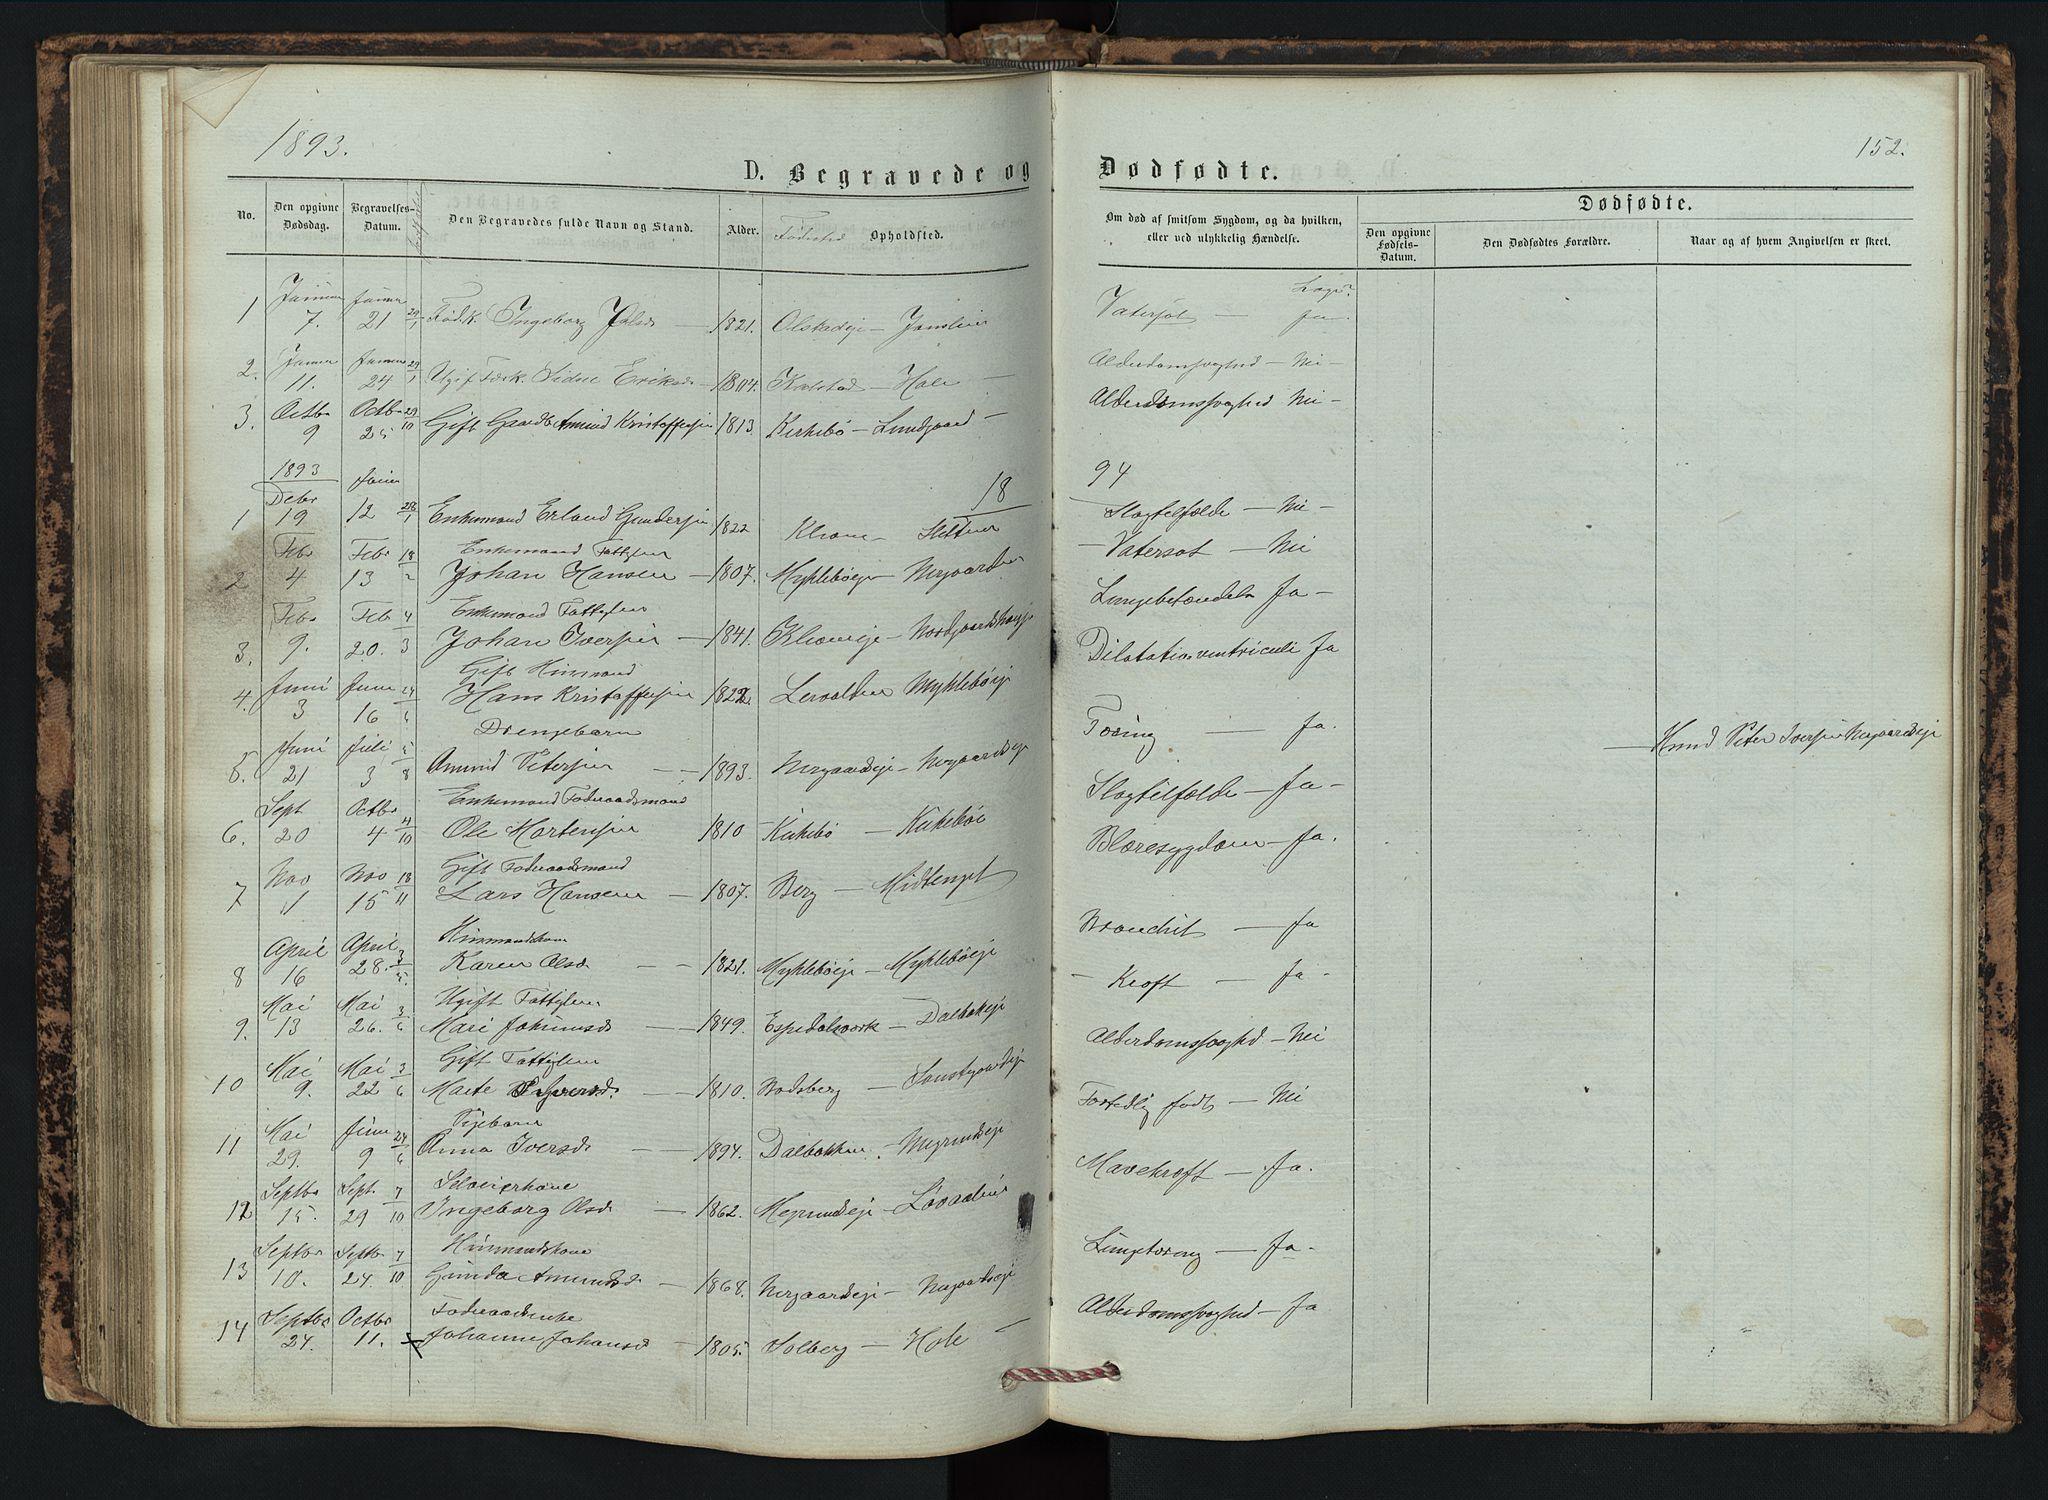 SAH, Vestre Gausdal prestekontor, Klokkerbok nr. 2, 1874-1897, s. 152